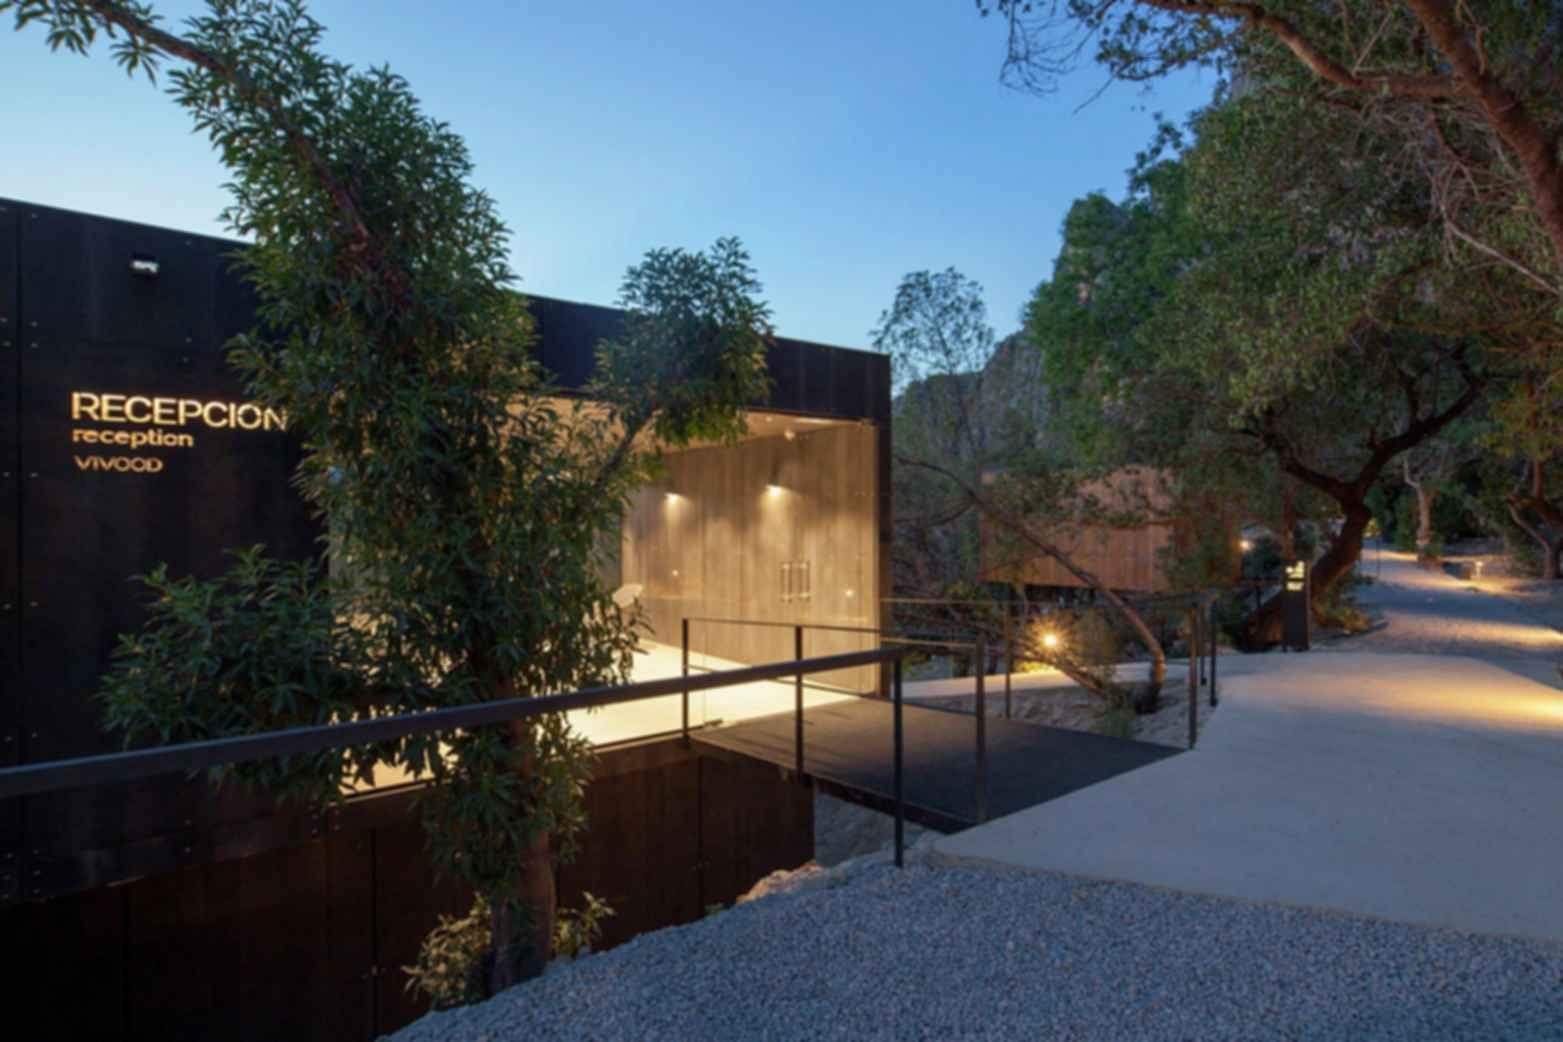 VIVOOD Landscape Hotels - Exterior/Reception